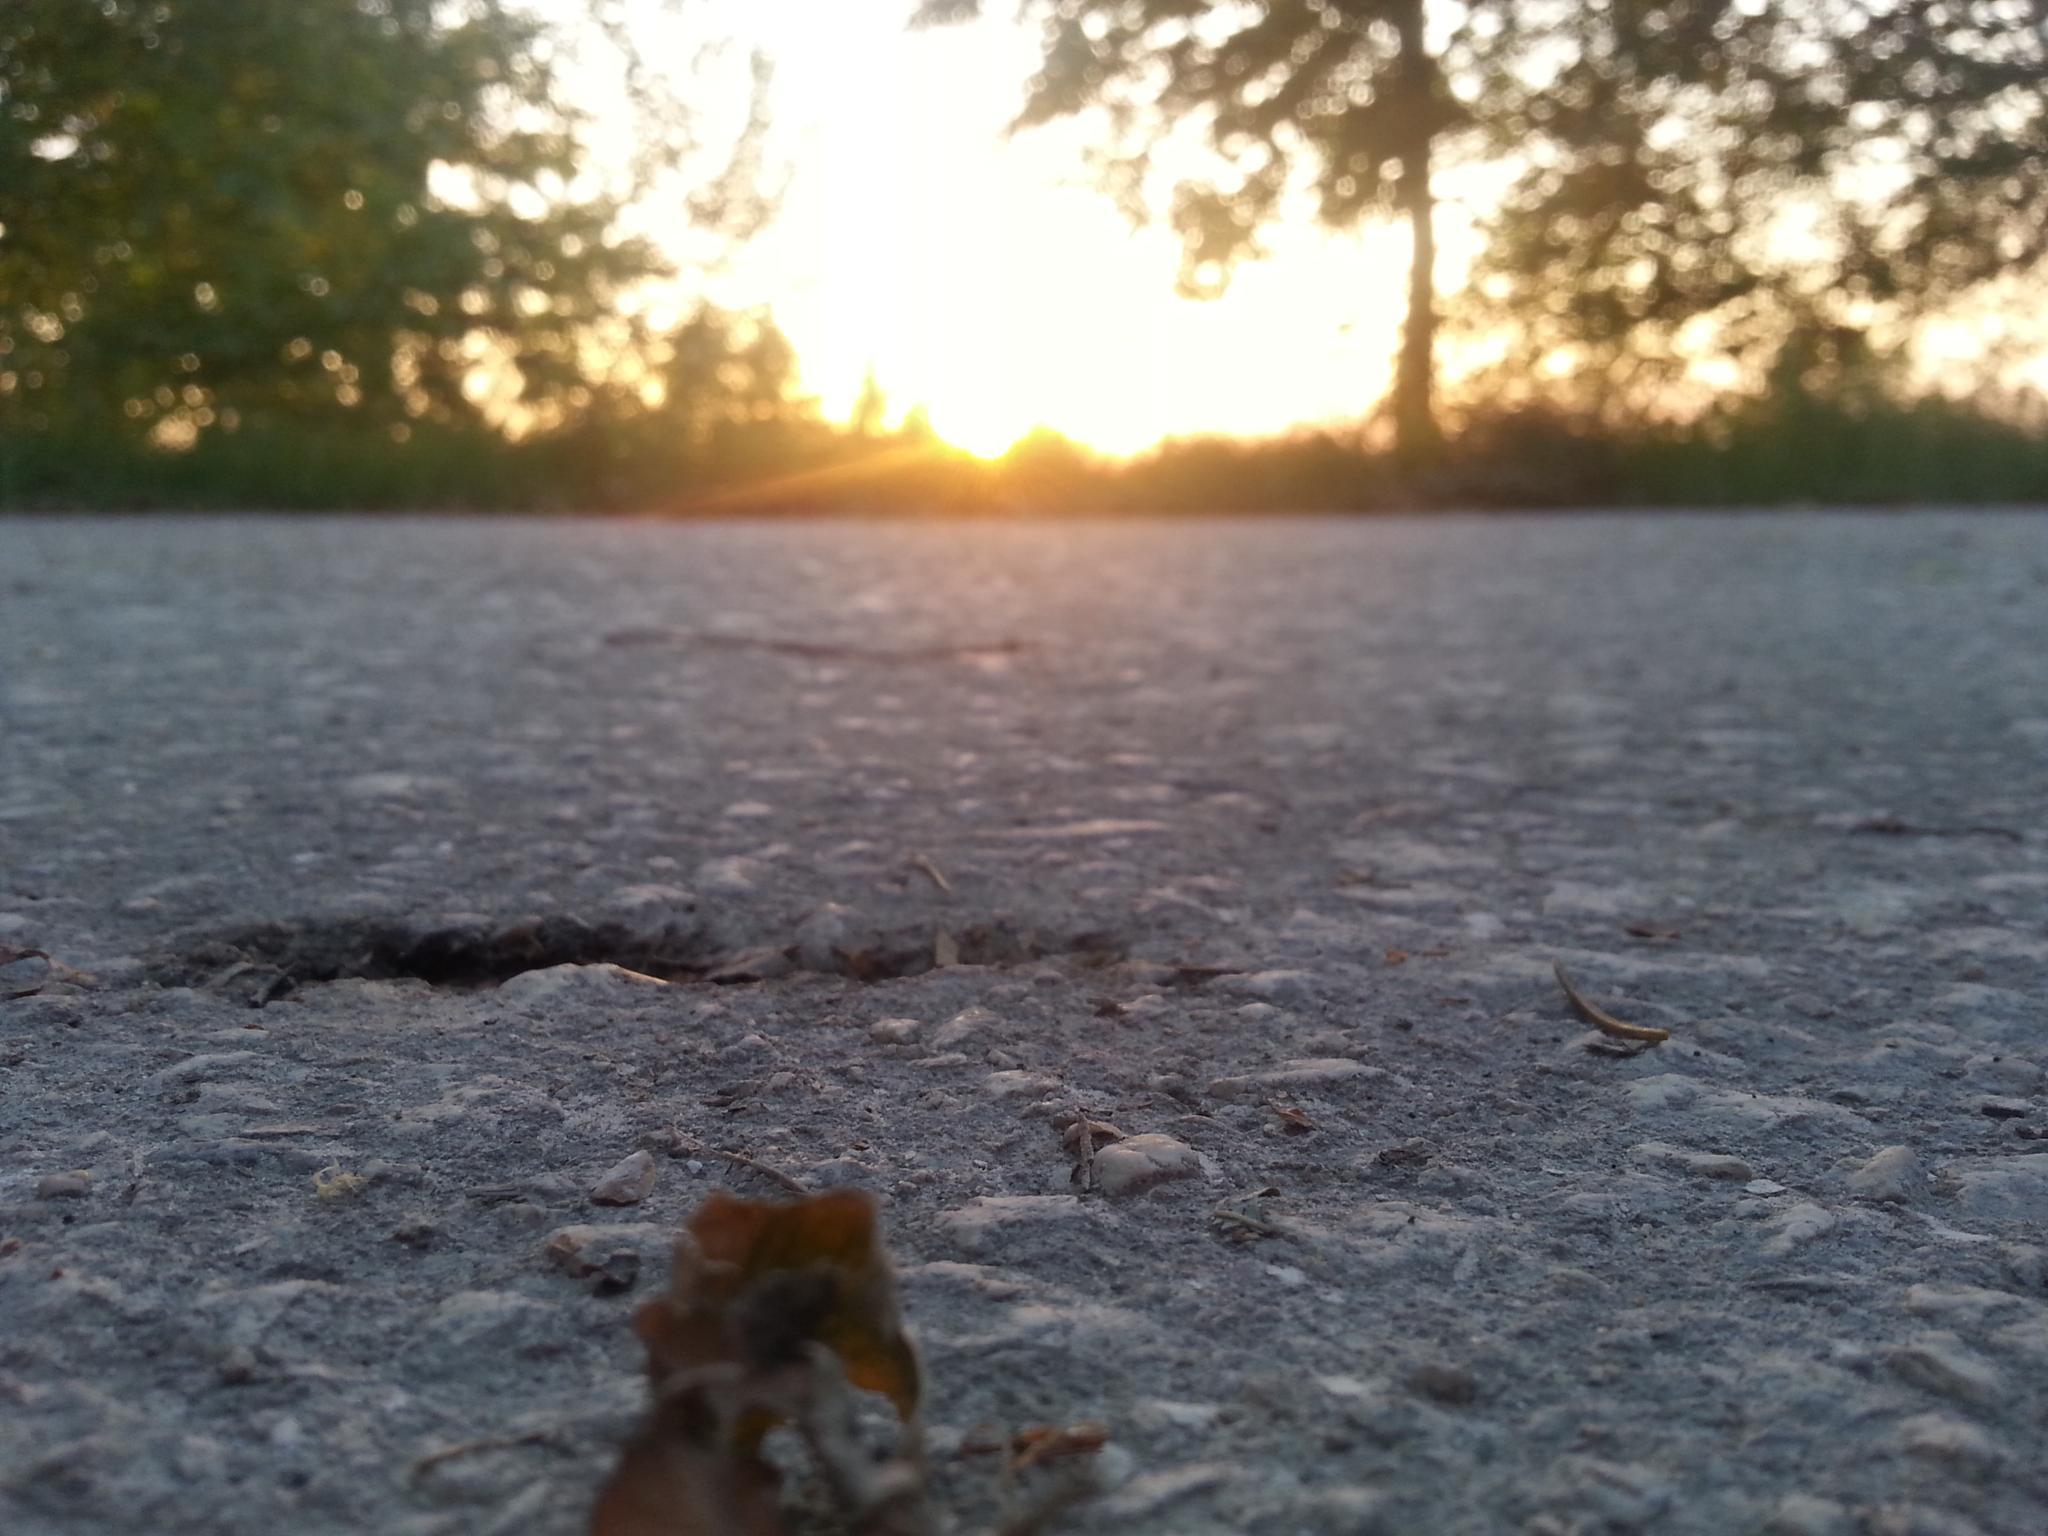 Sunset by Manol